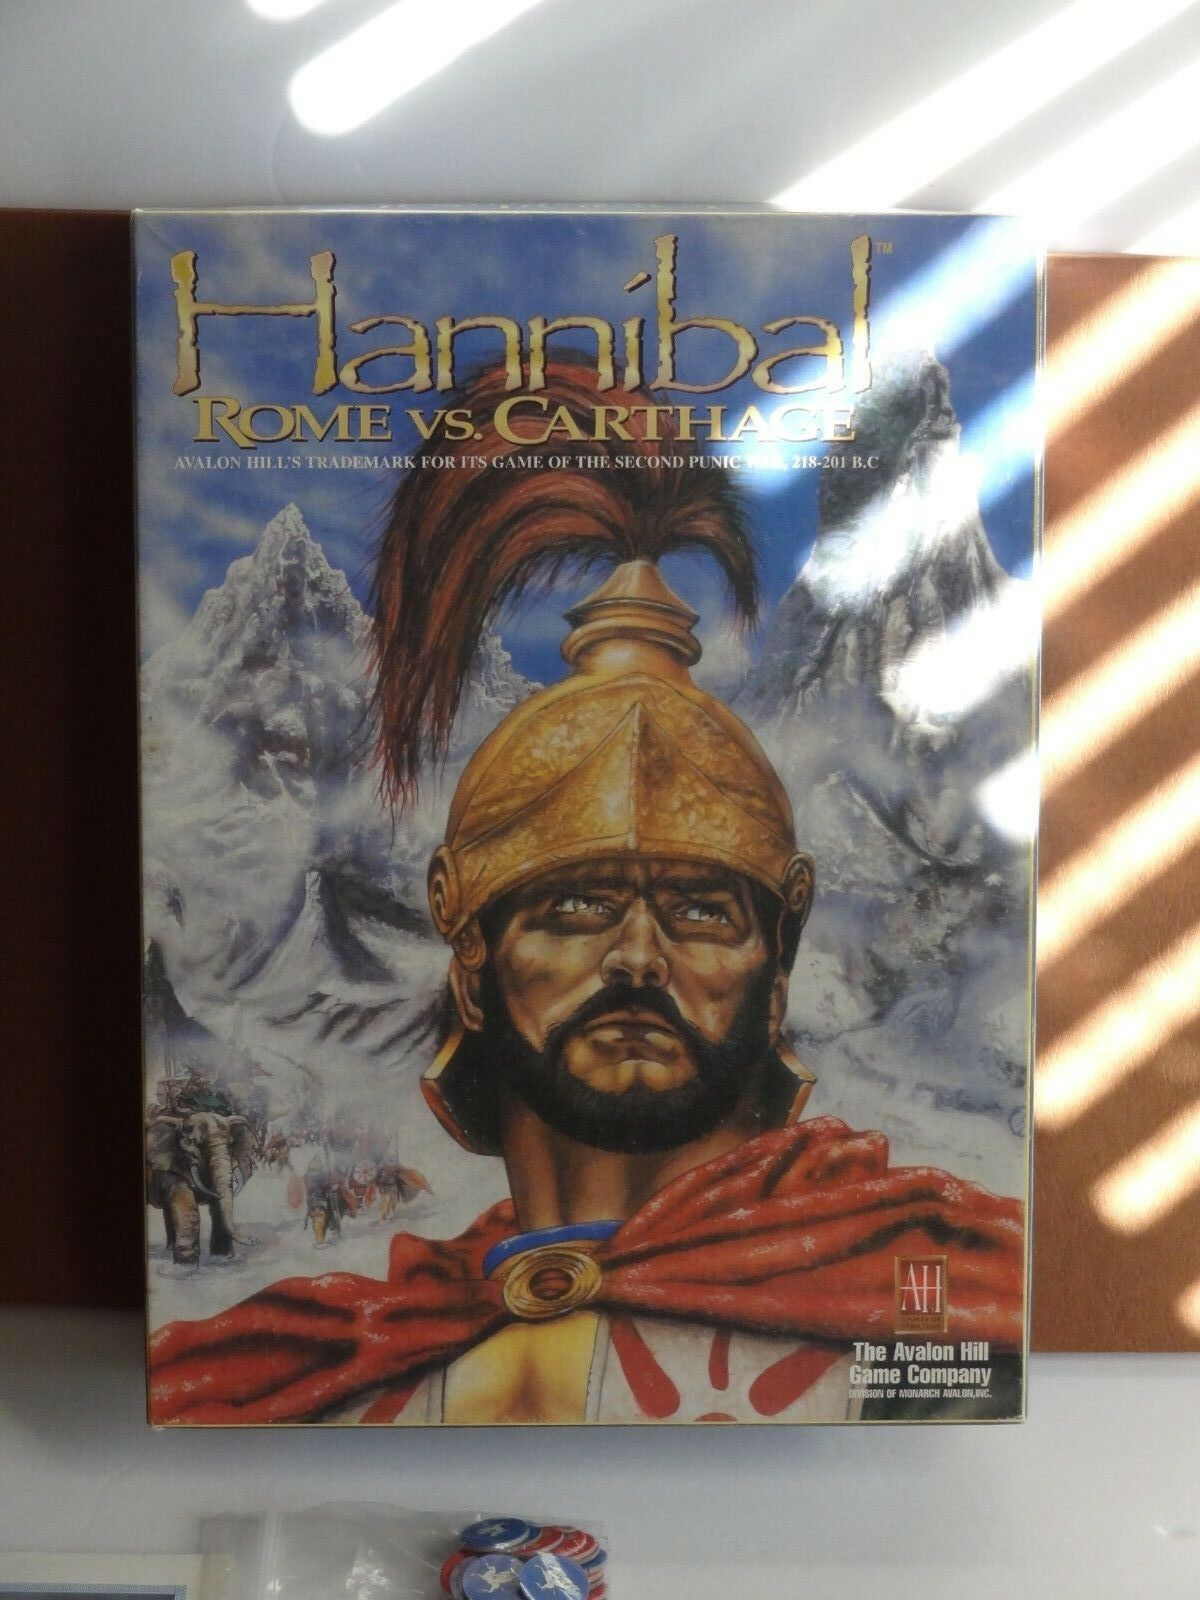 Hannibal rom gegen karthago avalon hill 1996